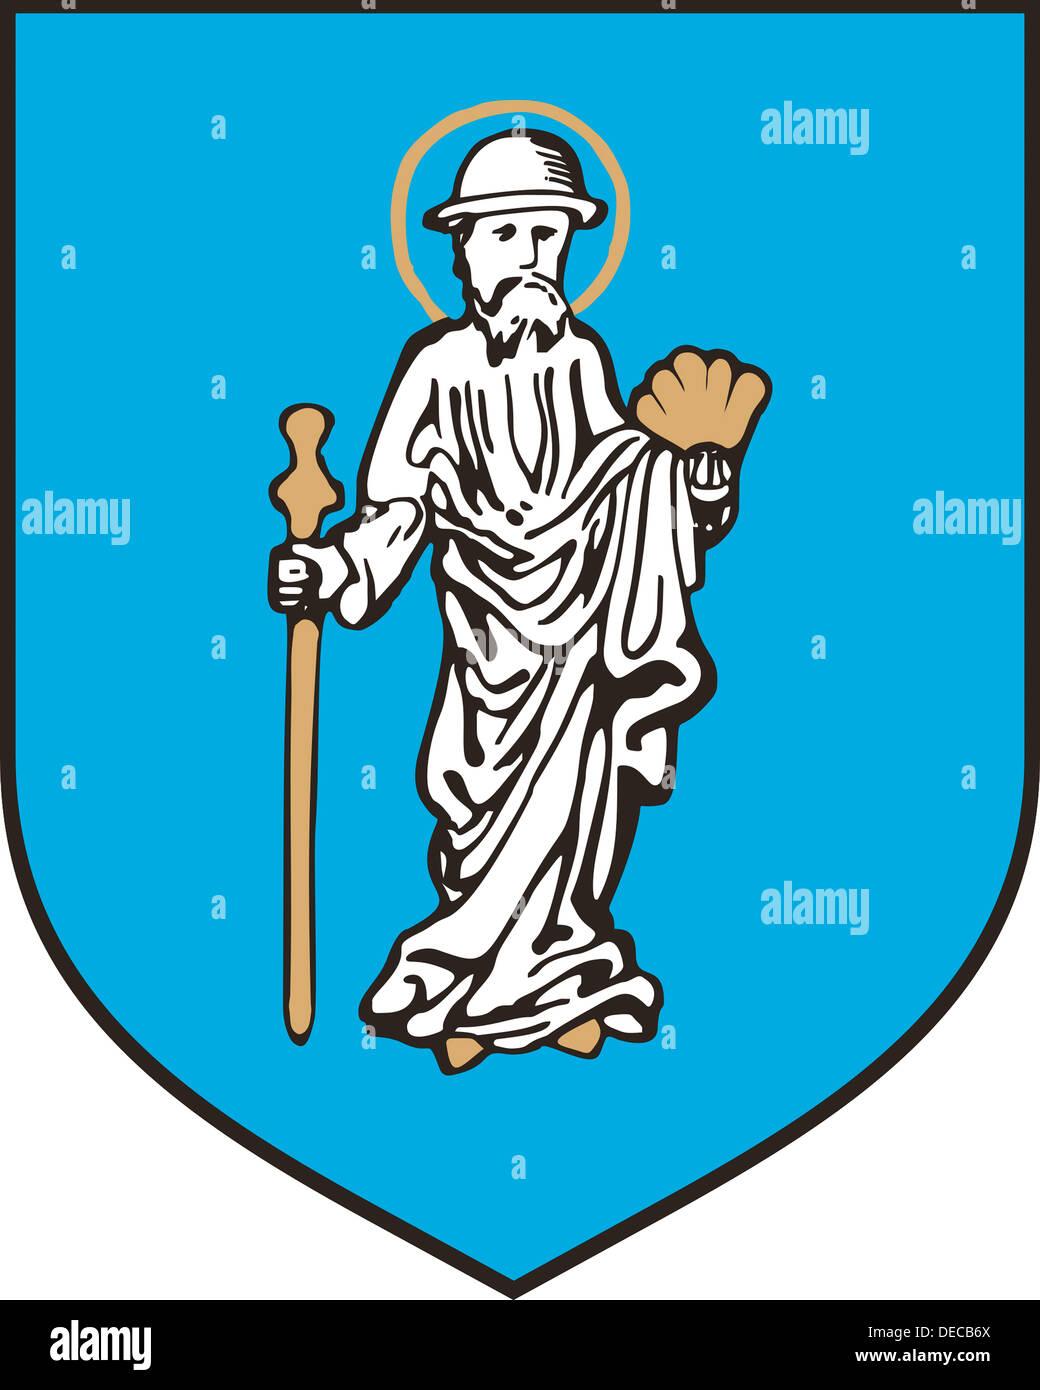 Coat of arms of the Polish city of Olsztyn. - Stock Image